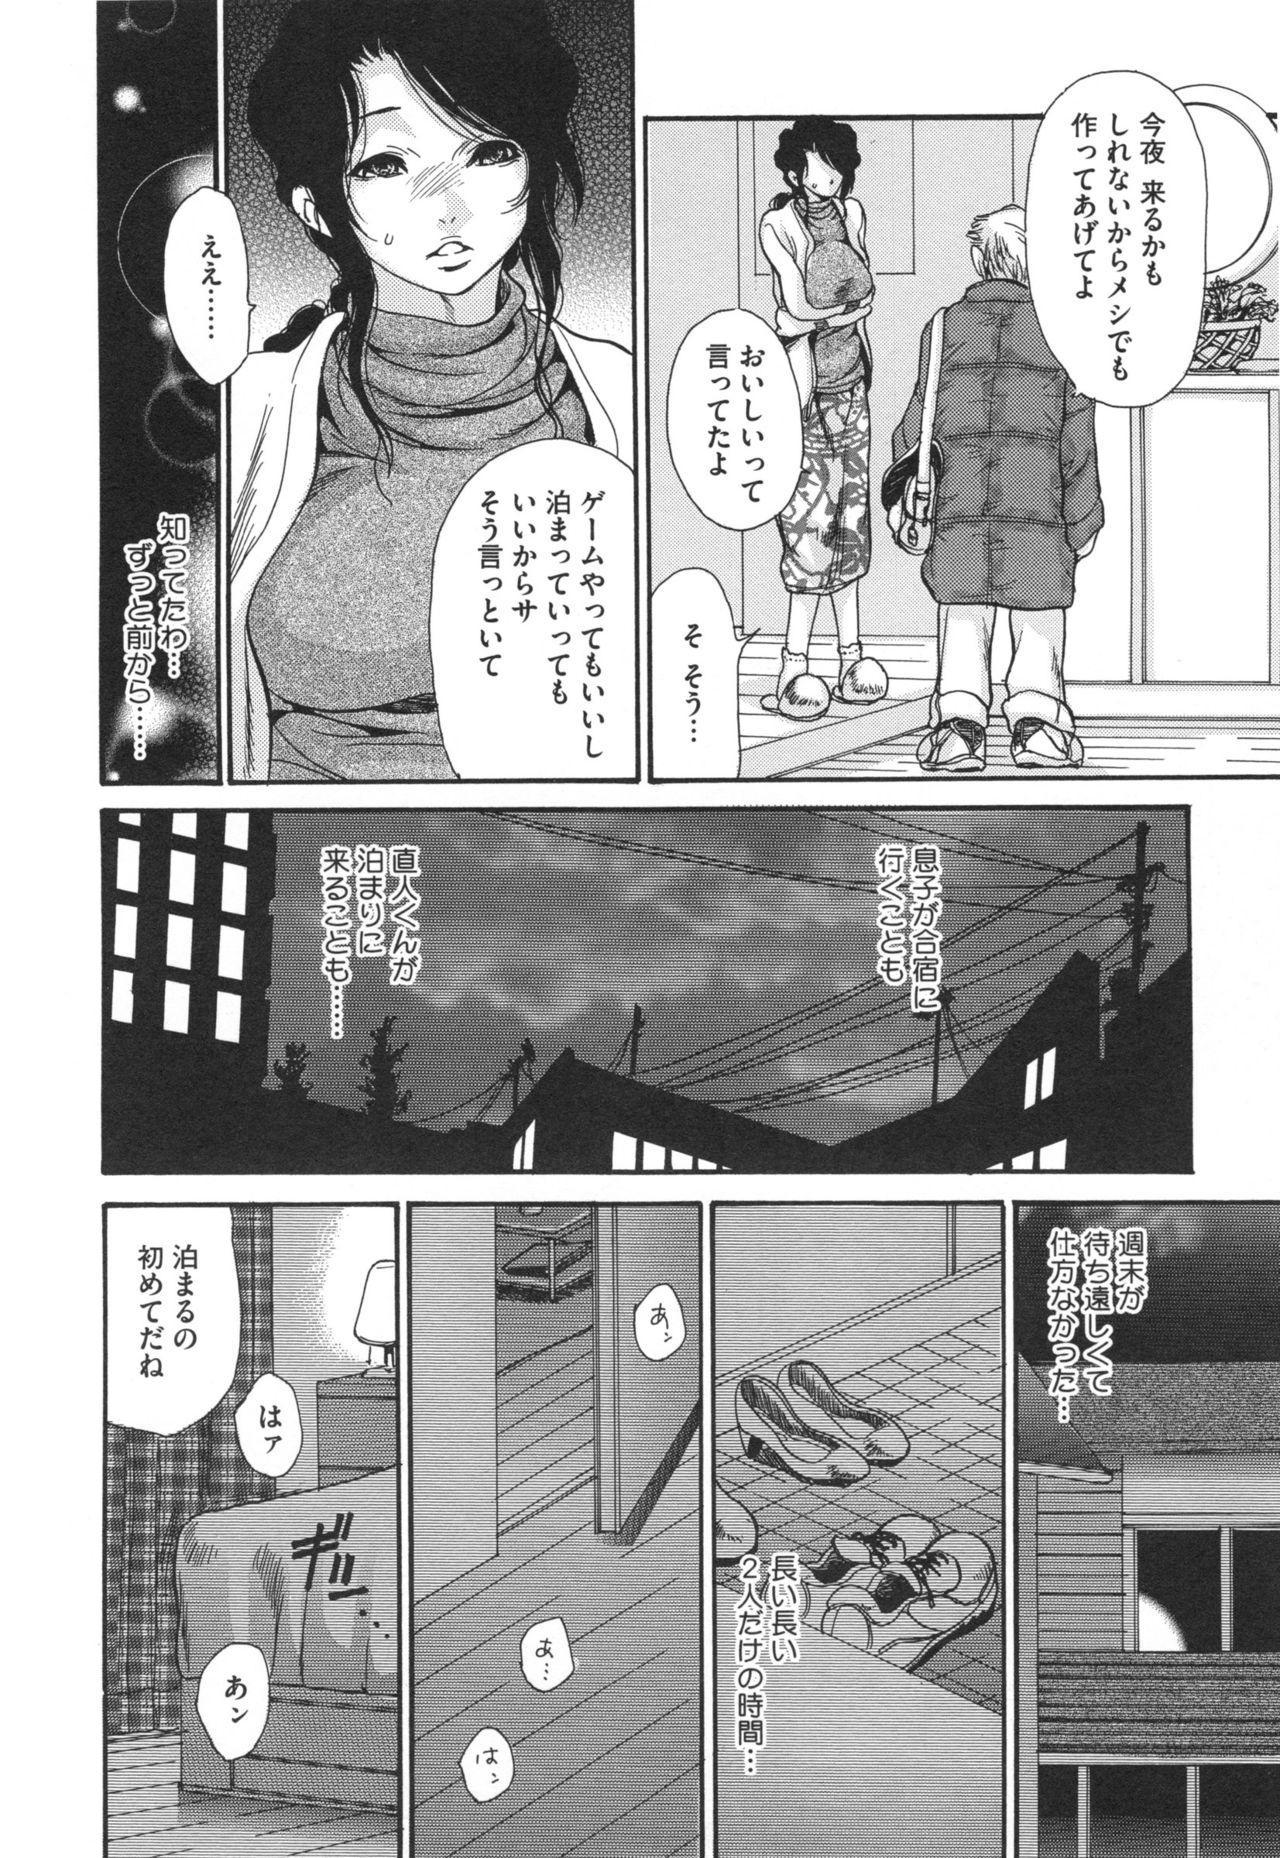 Niku-zuma Netorare Maniacs 76